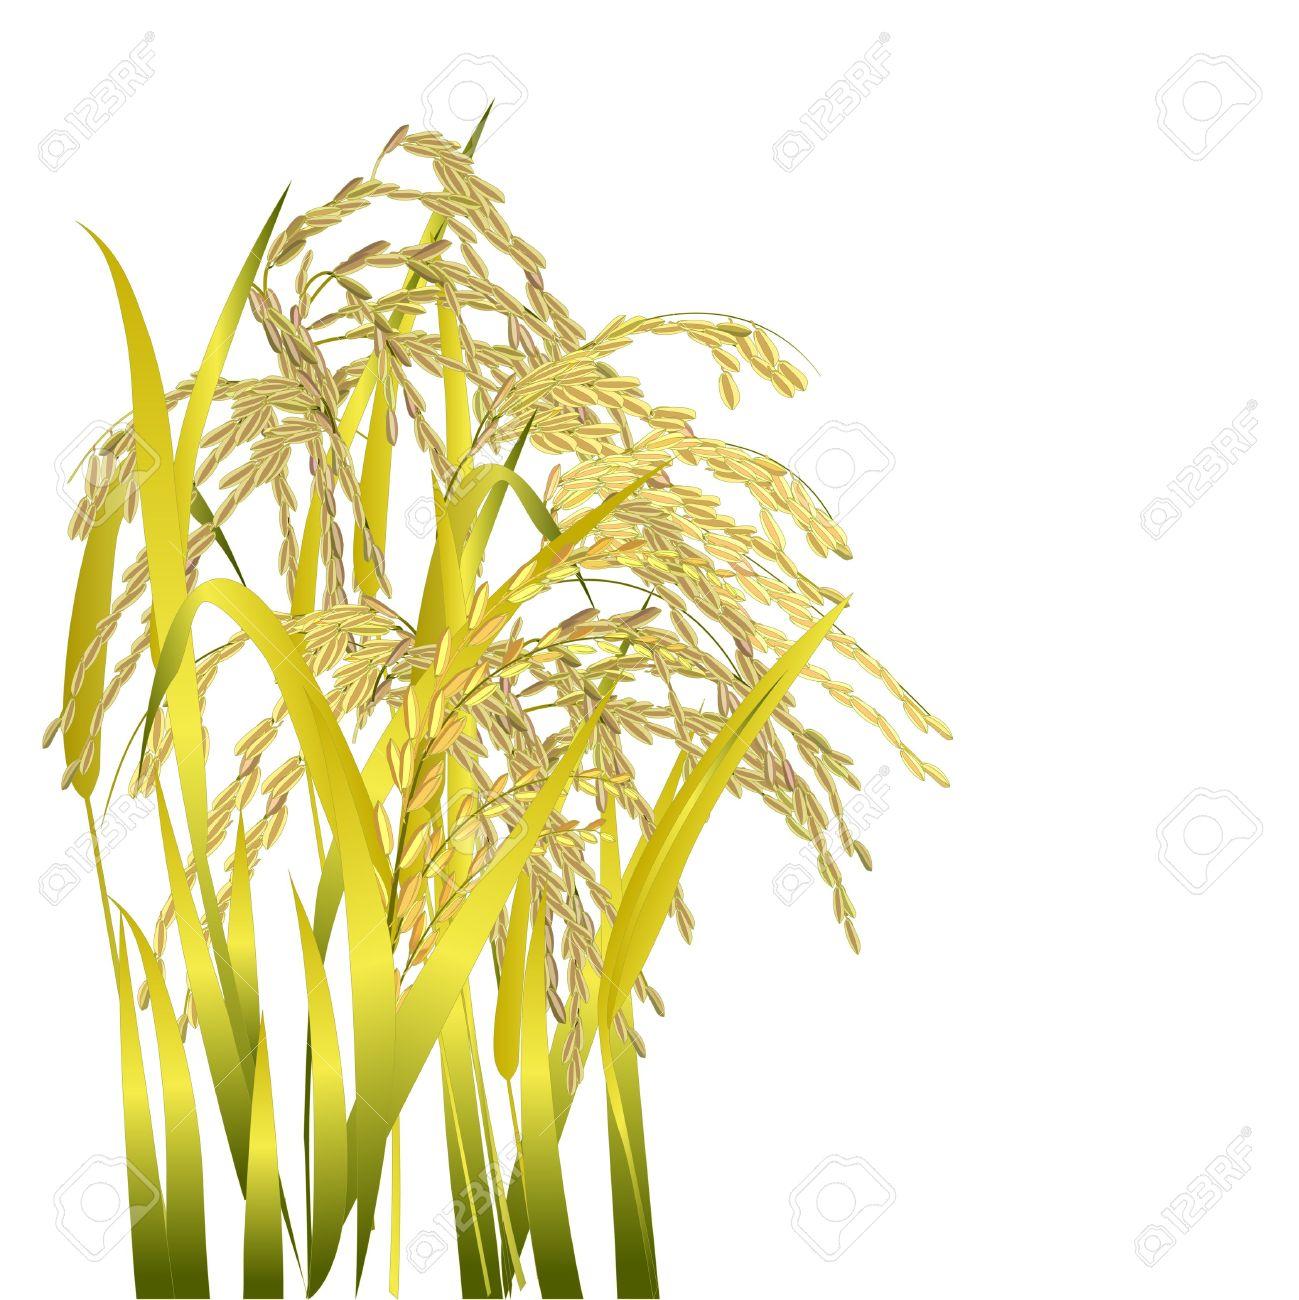 Clipart rice grains.